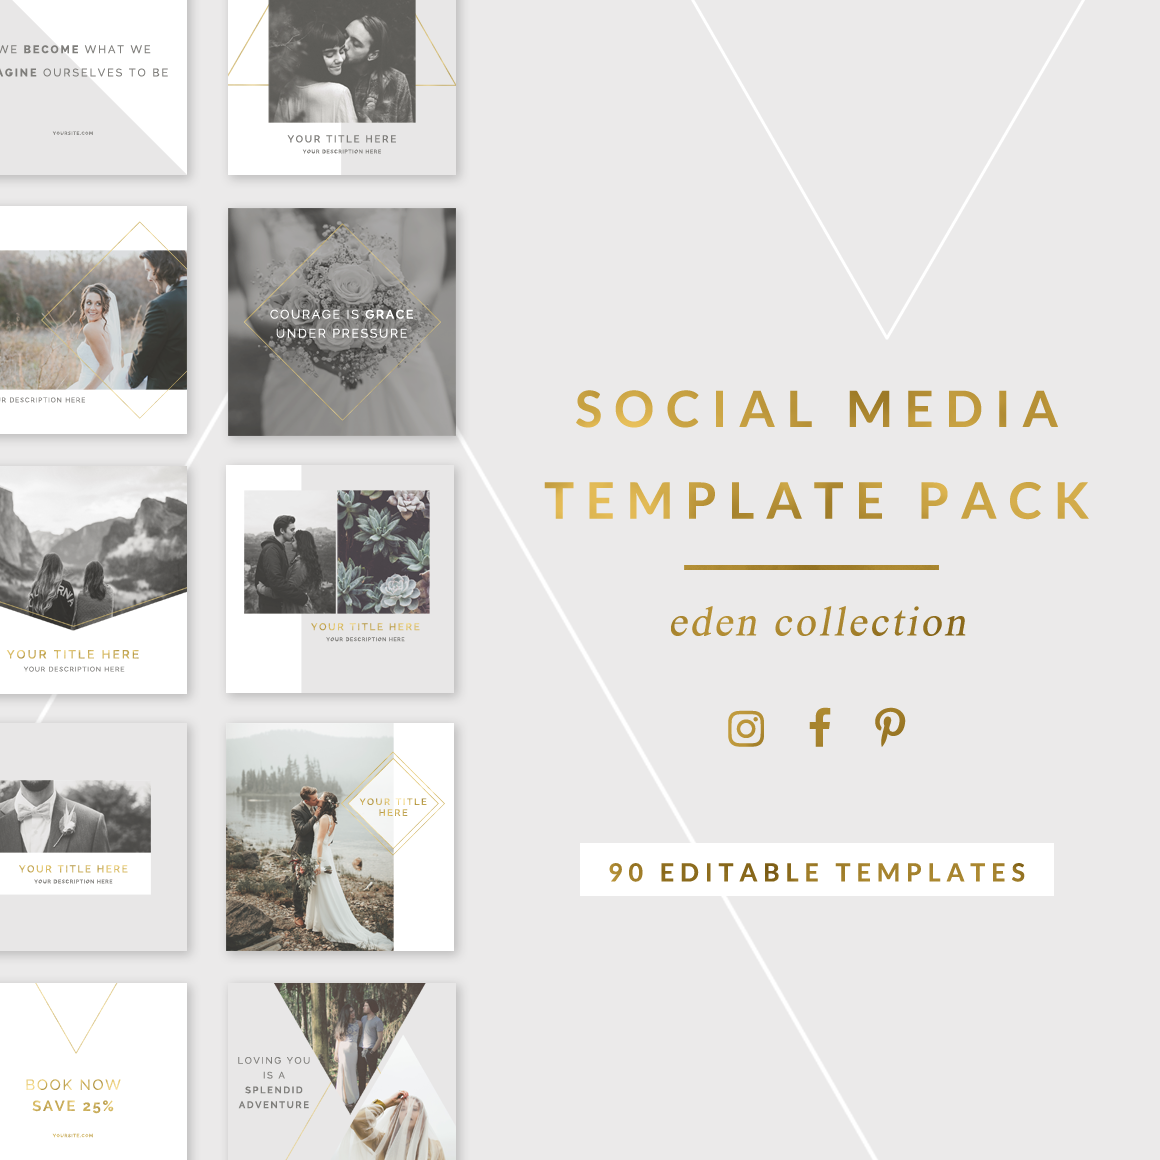 Social media templates for photographers editable templates for instagram photoshop facebook for Social media templates psd